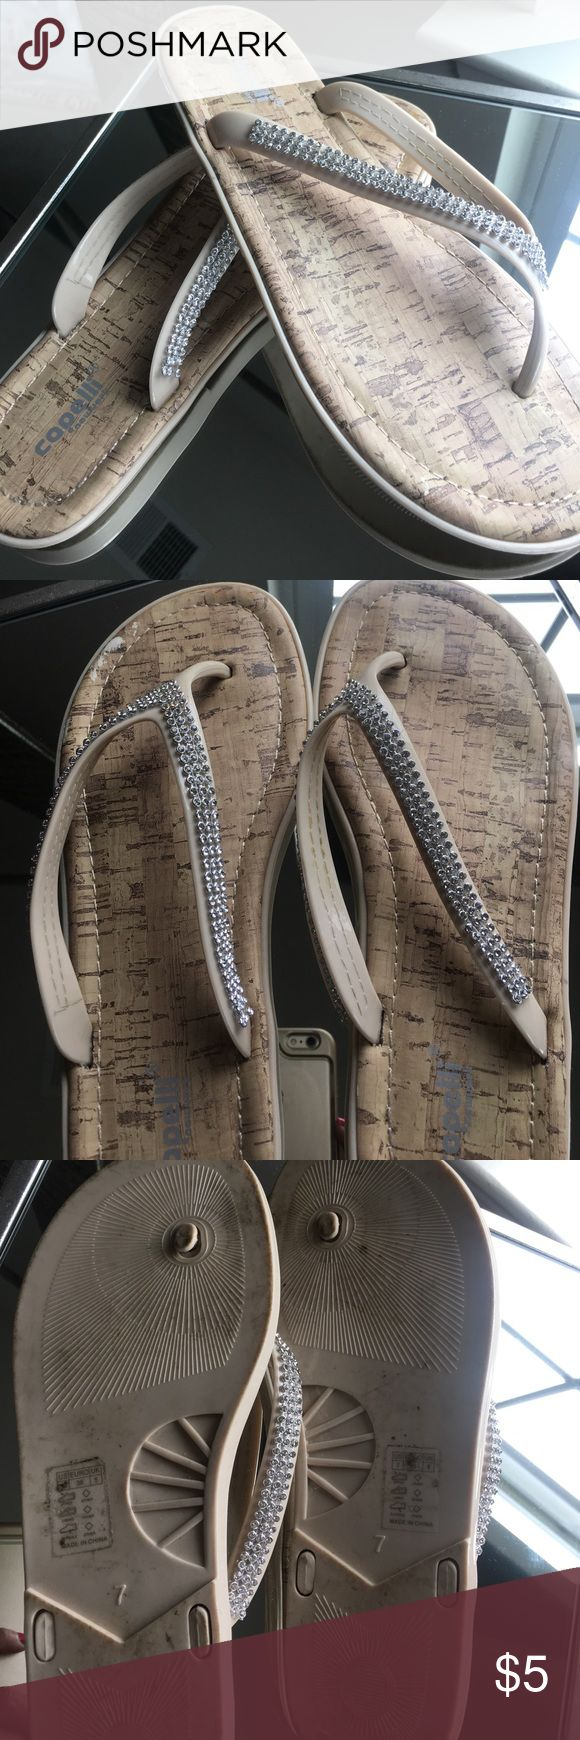 Crystal flip flops Capelli Beige crystal flip flops Capelli of New York Shoes Sandals